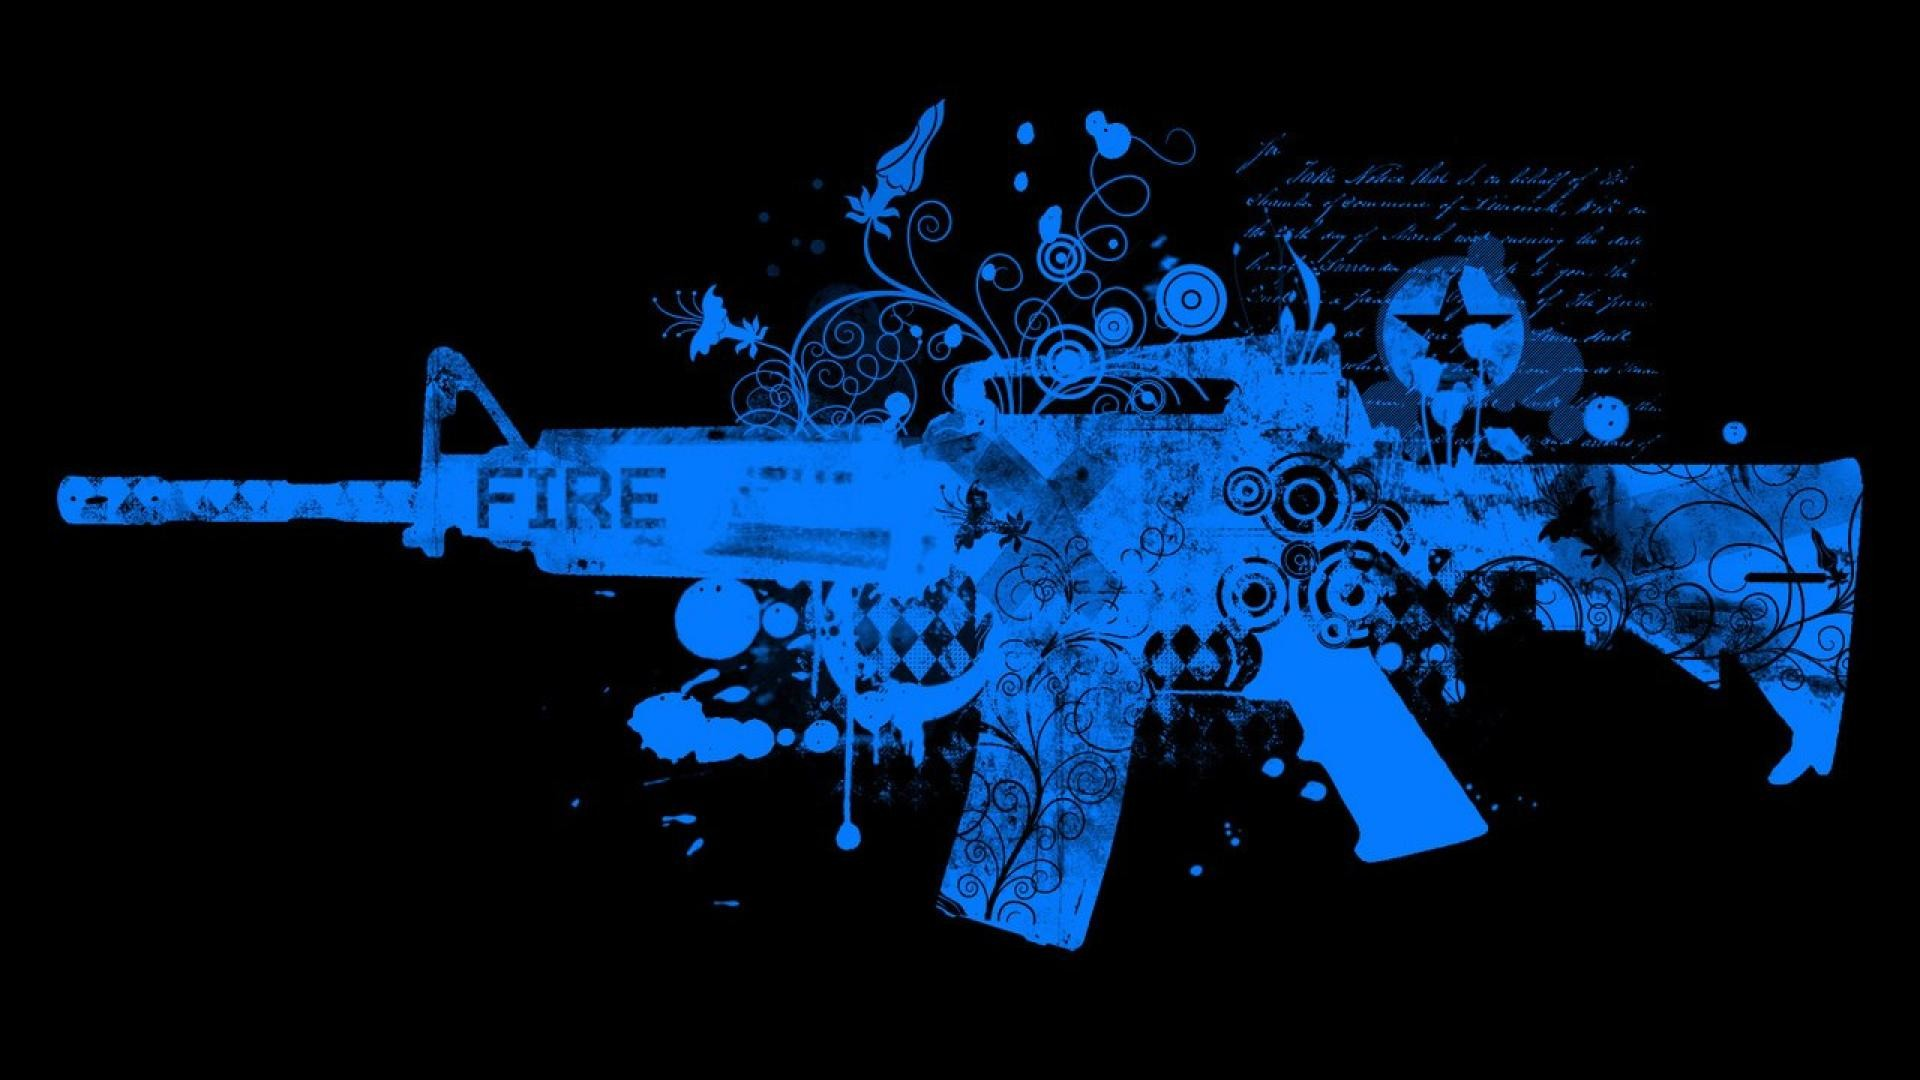 … abstract guns hd wallpaper hd latest wallpapers …